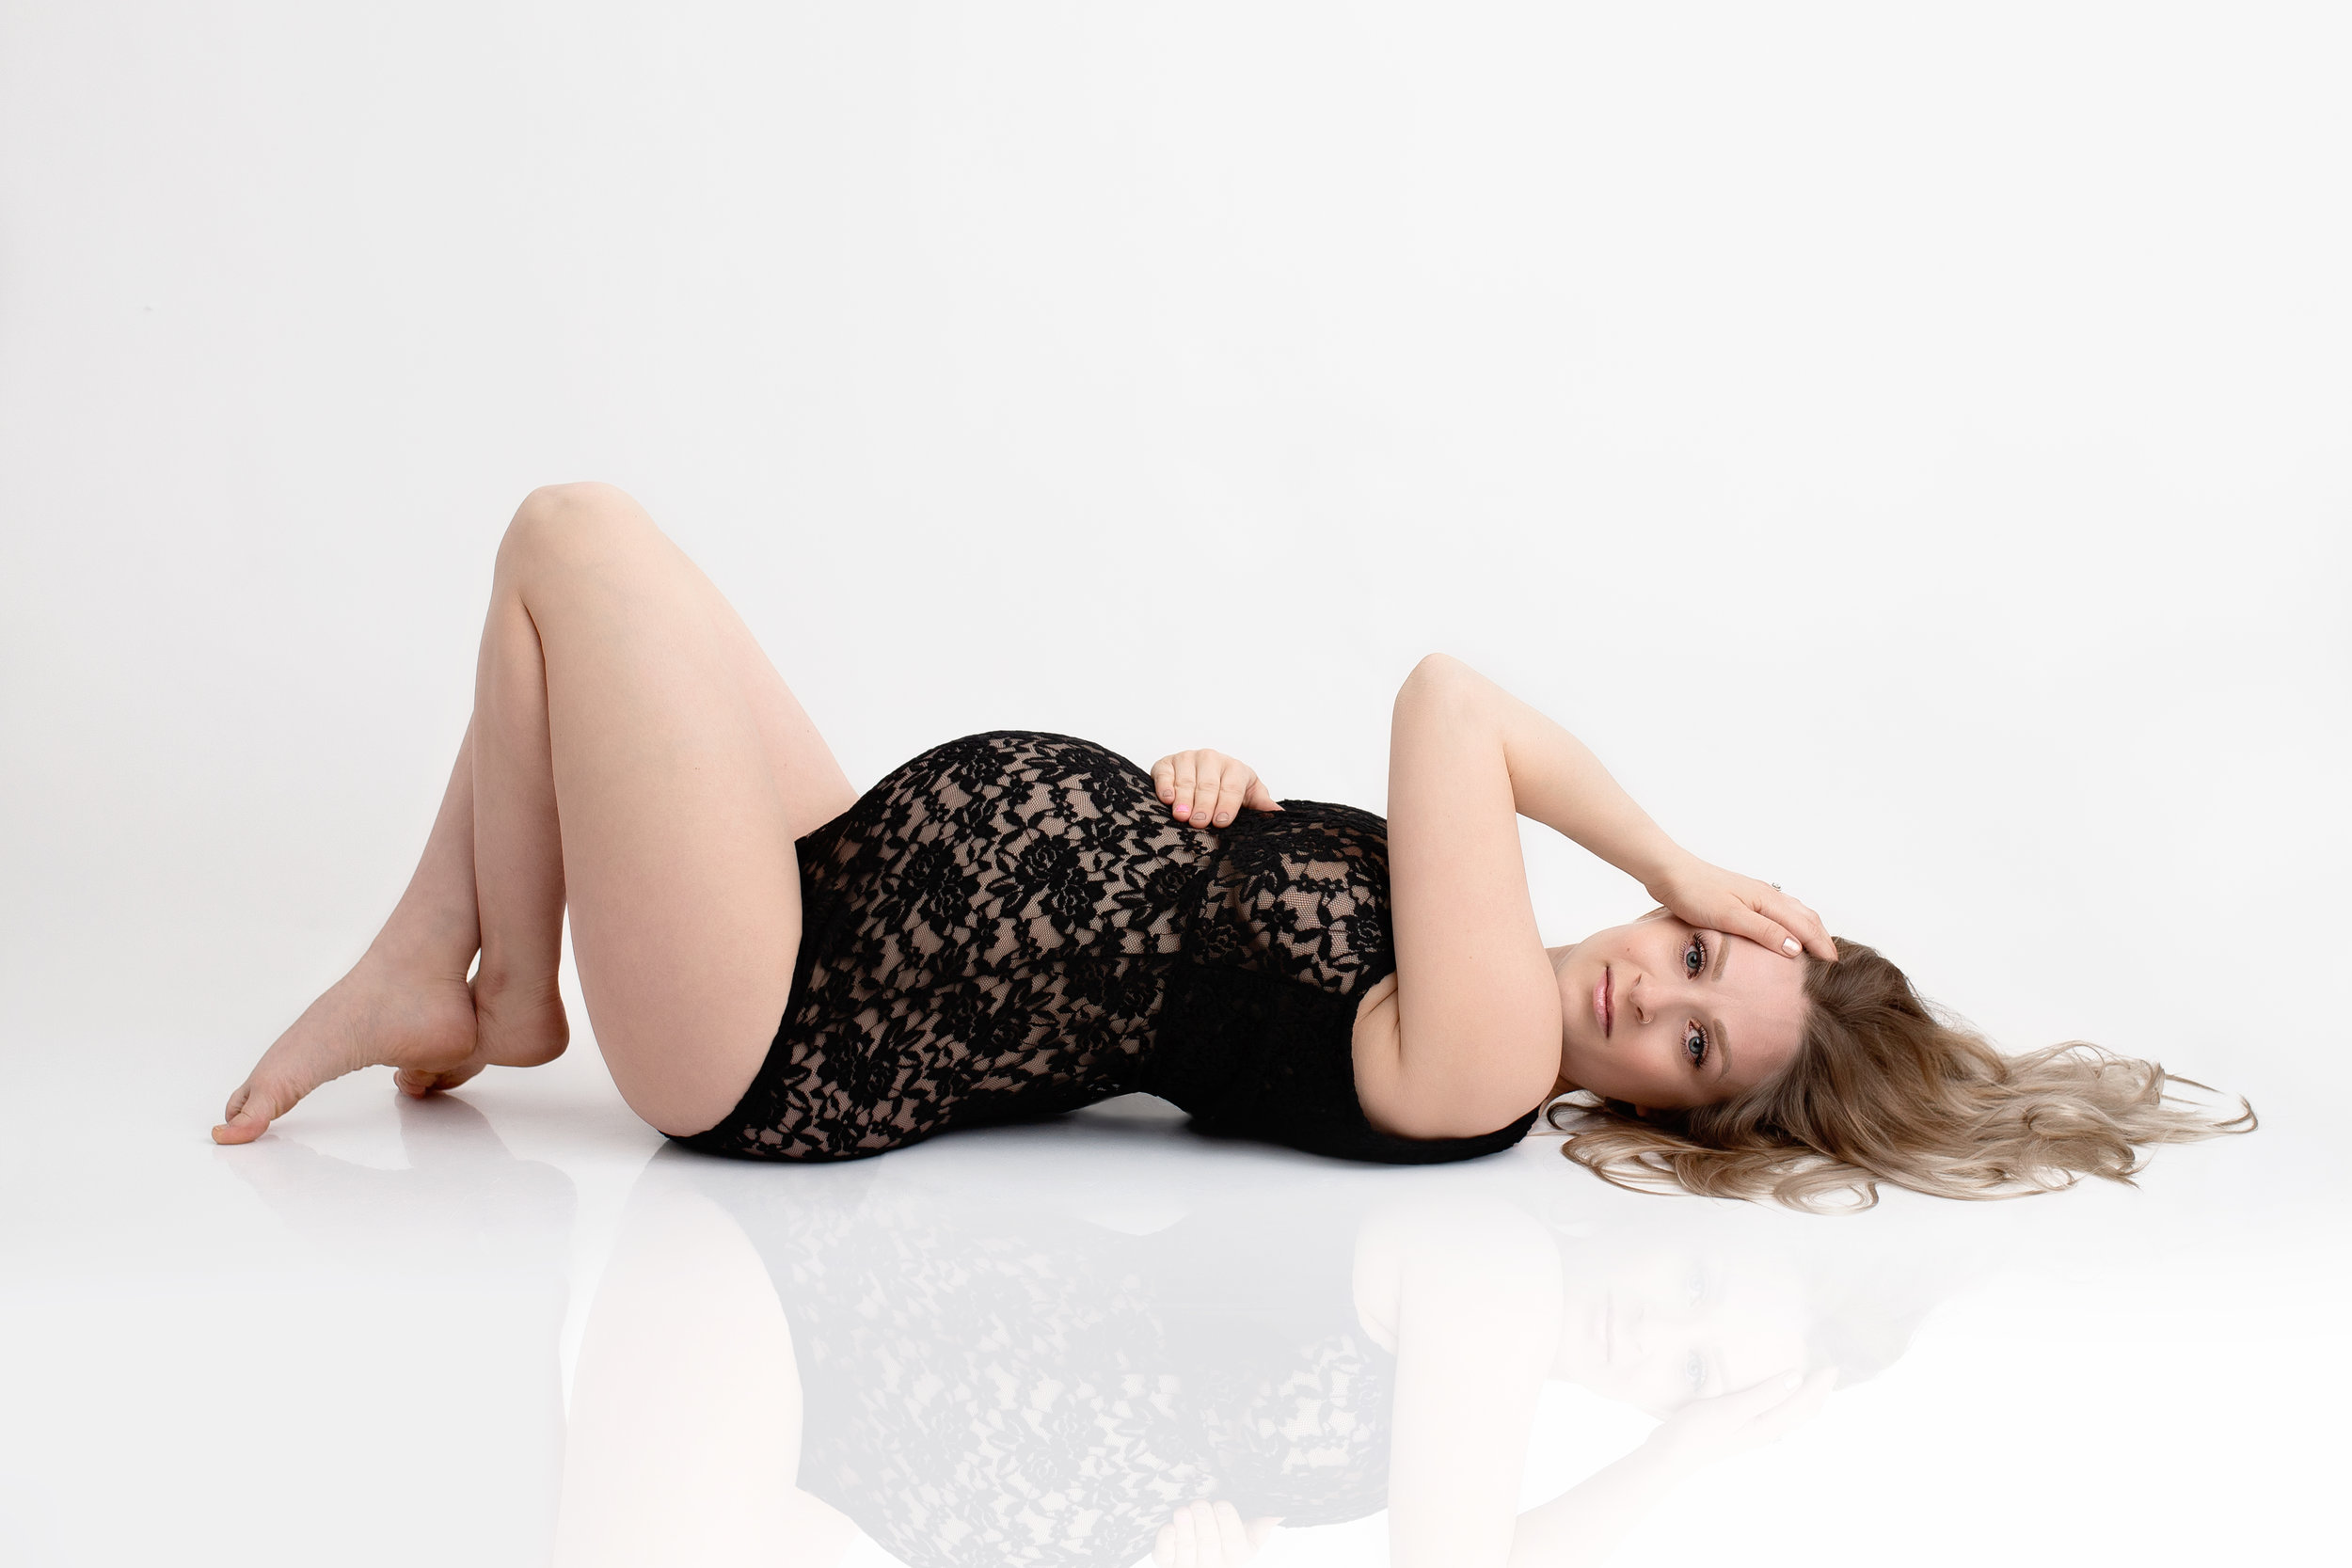 fine art maternity photography edmonton best photographer st-albert maternity photo shoot